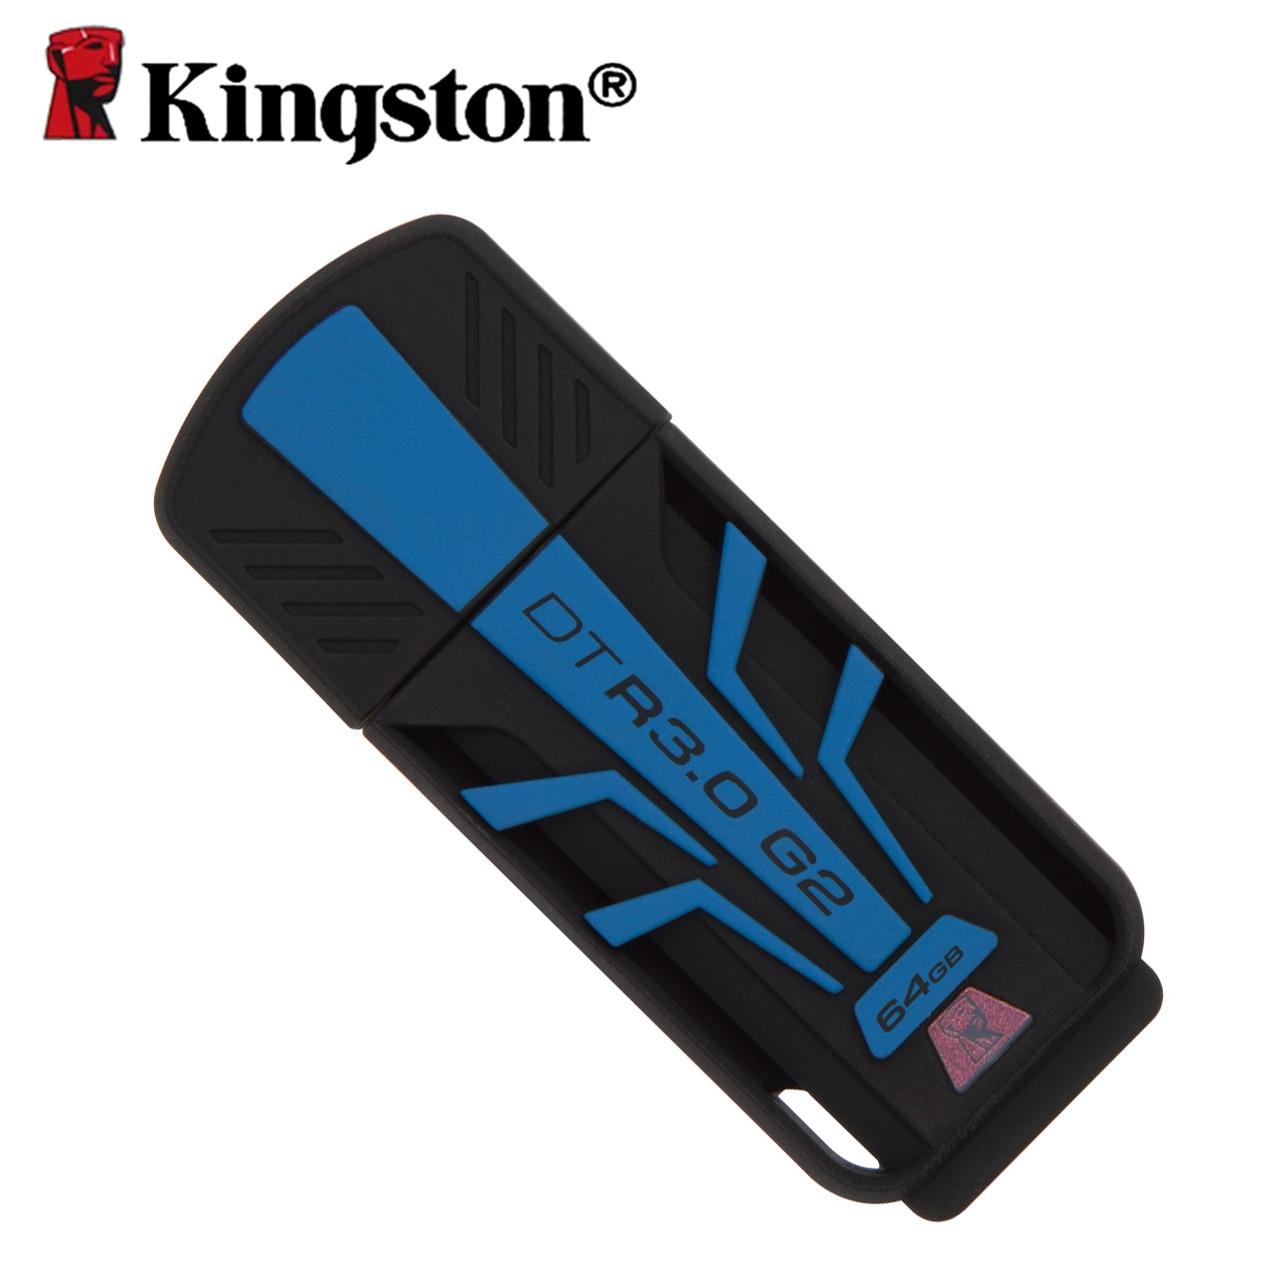 Usb Flash Disk 32gb Kingston Flashdisk Datatraveler Microduo 30 Micro Otg Waterproof G2 Pen Drive 120mb R Shock Resistant Pendrive Memoria Key